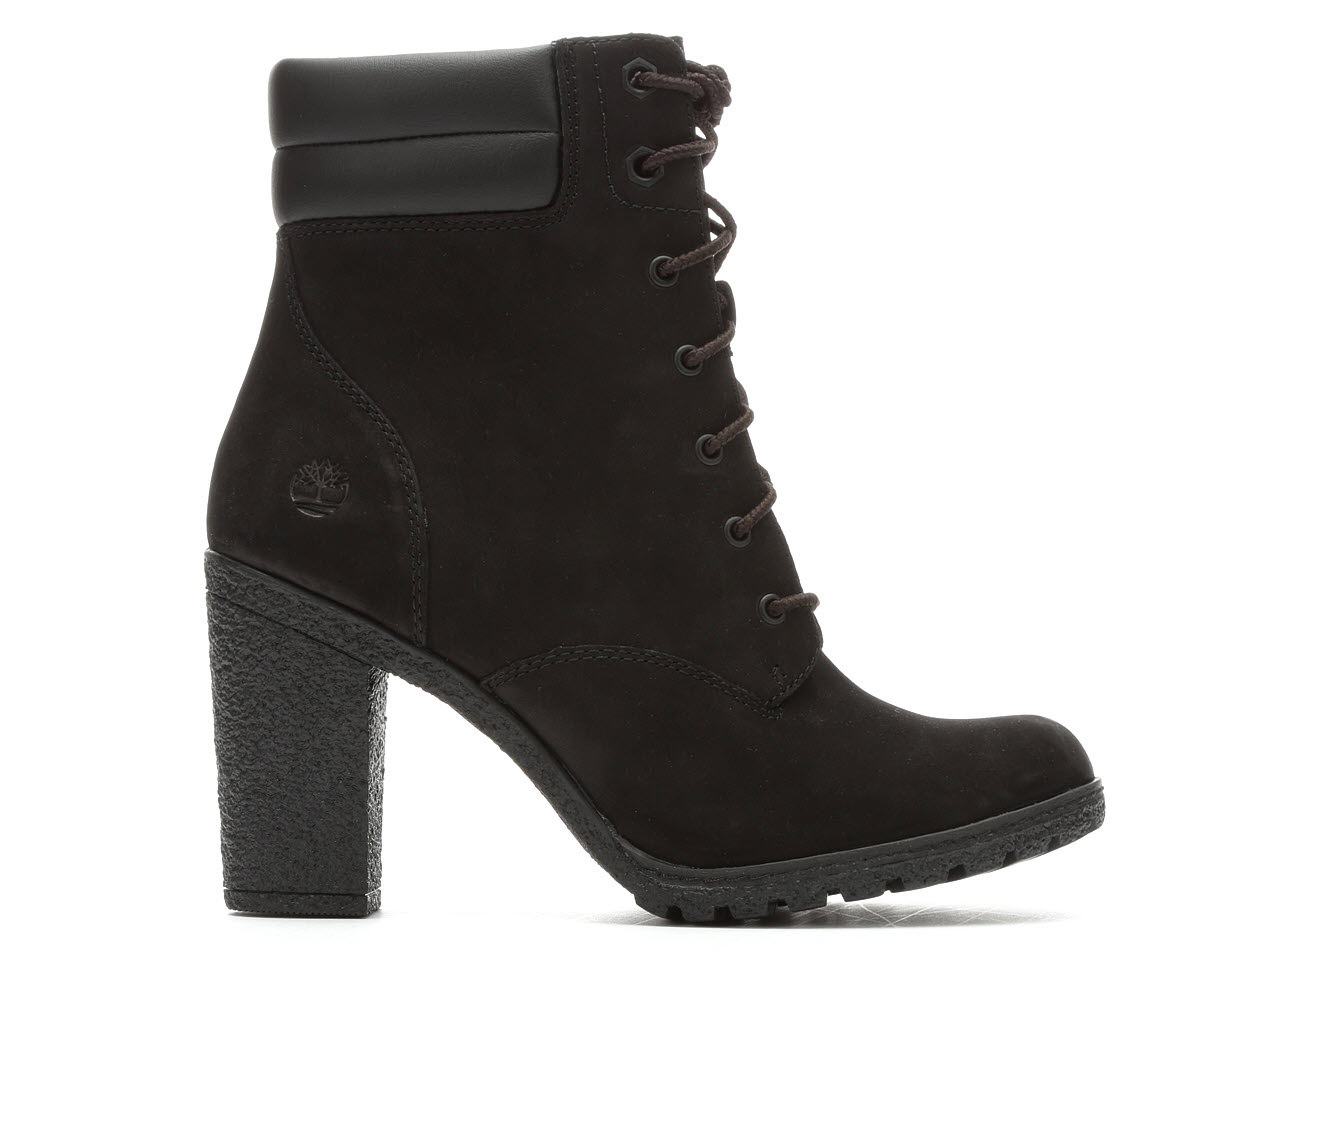 Timberland Tillston Double Collar Women's Boot (Black Leather)